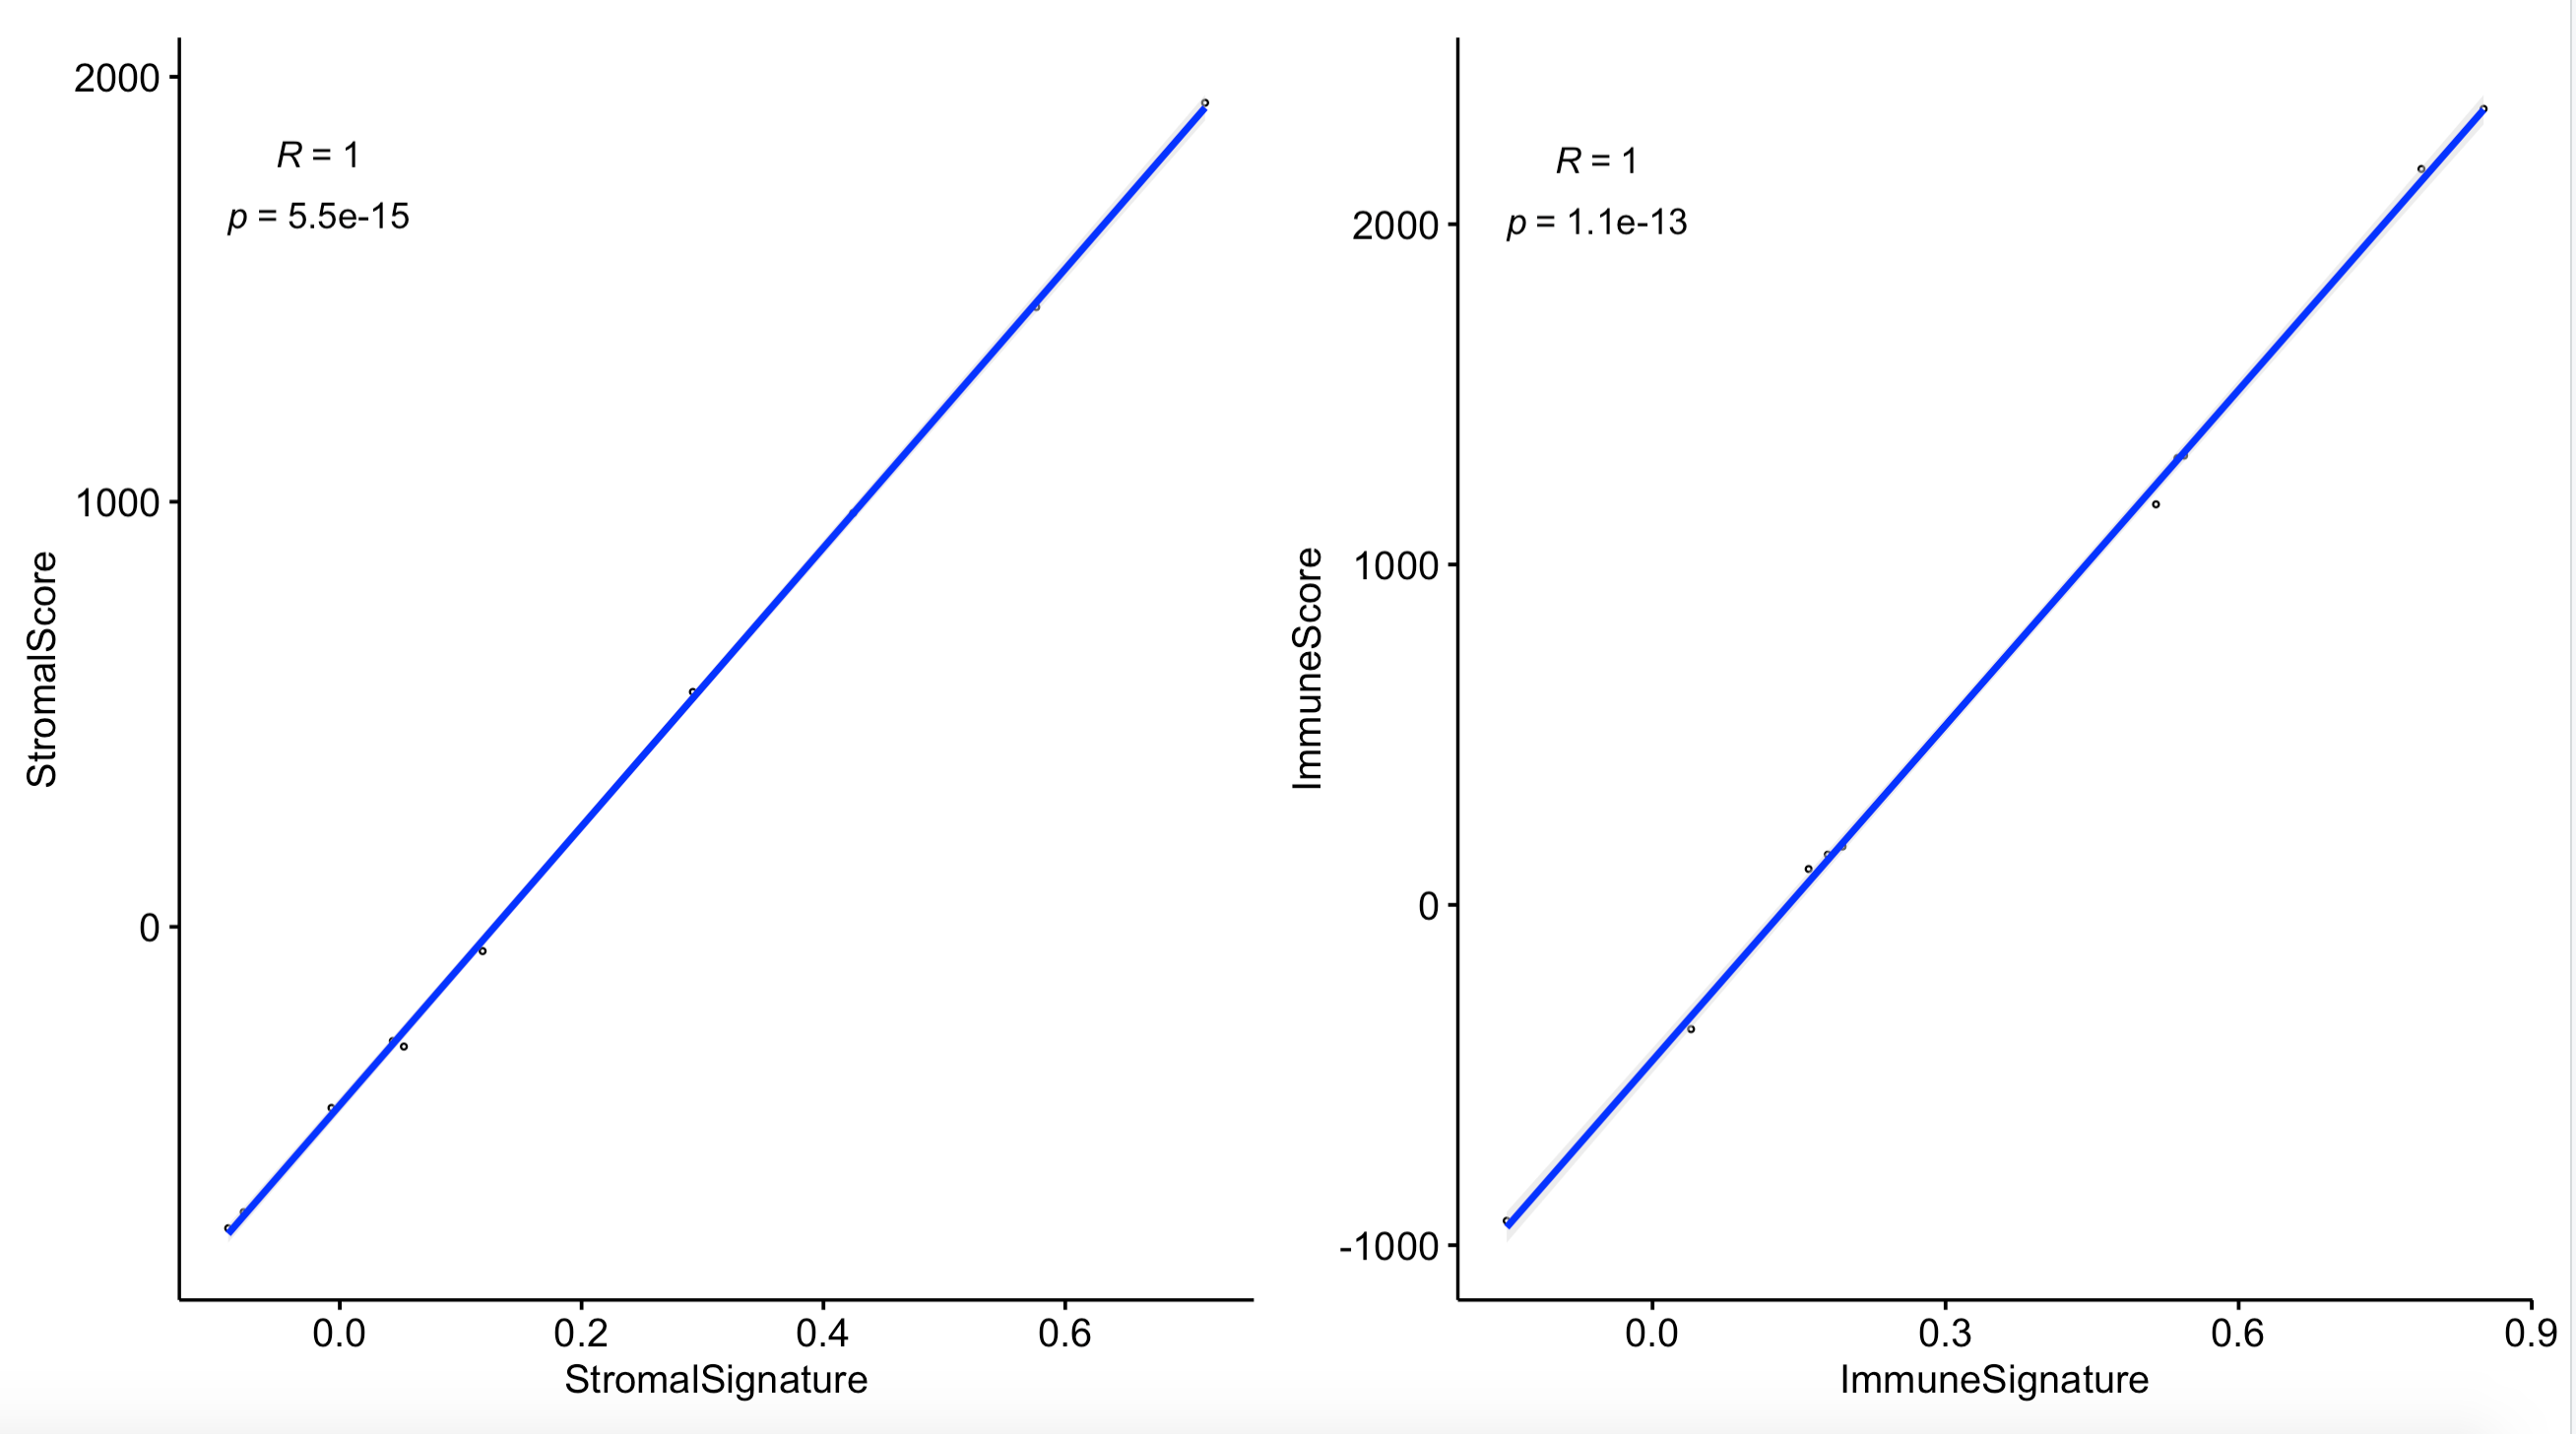 estimate就是两个基因集的ssGSEA算法